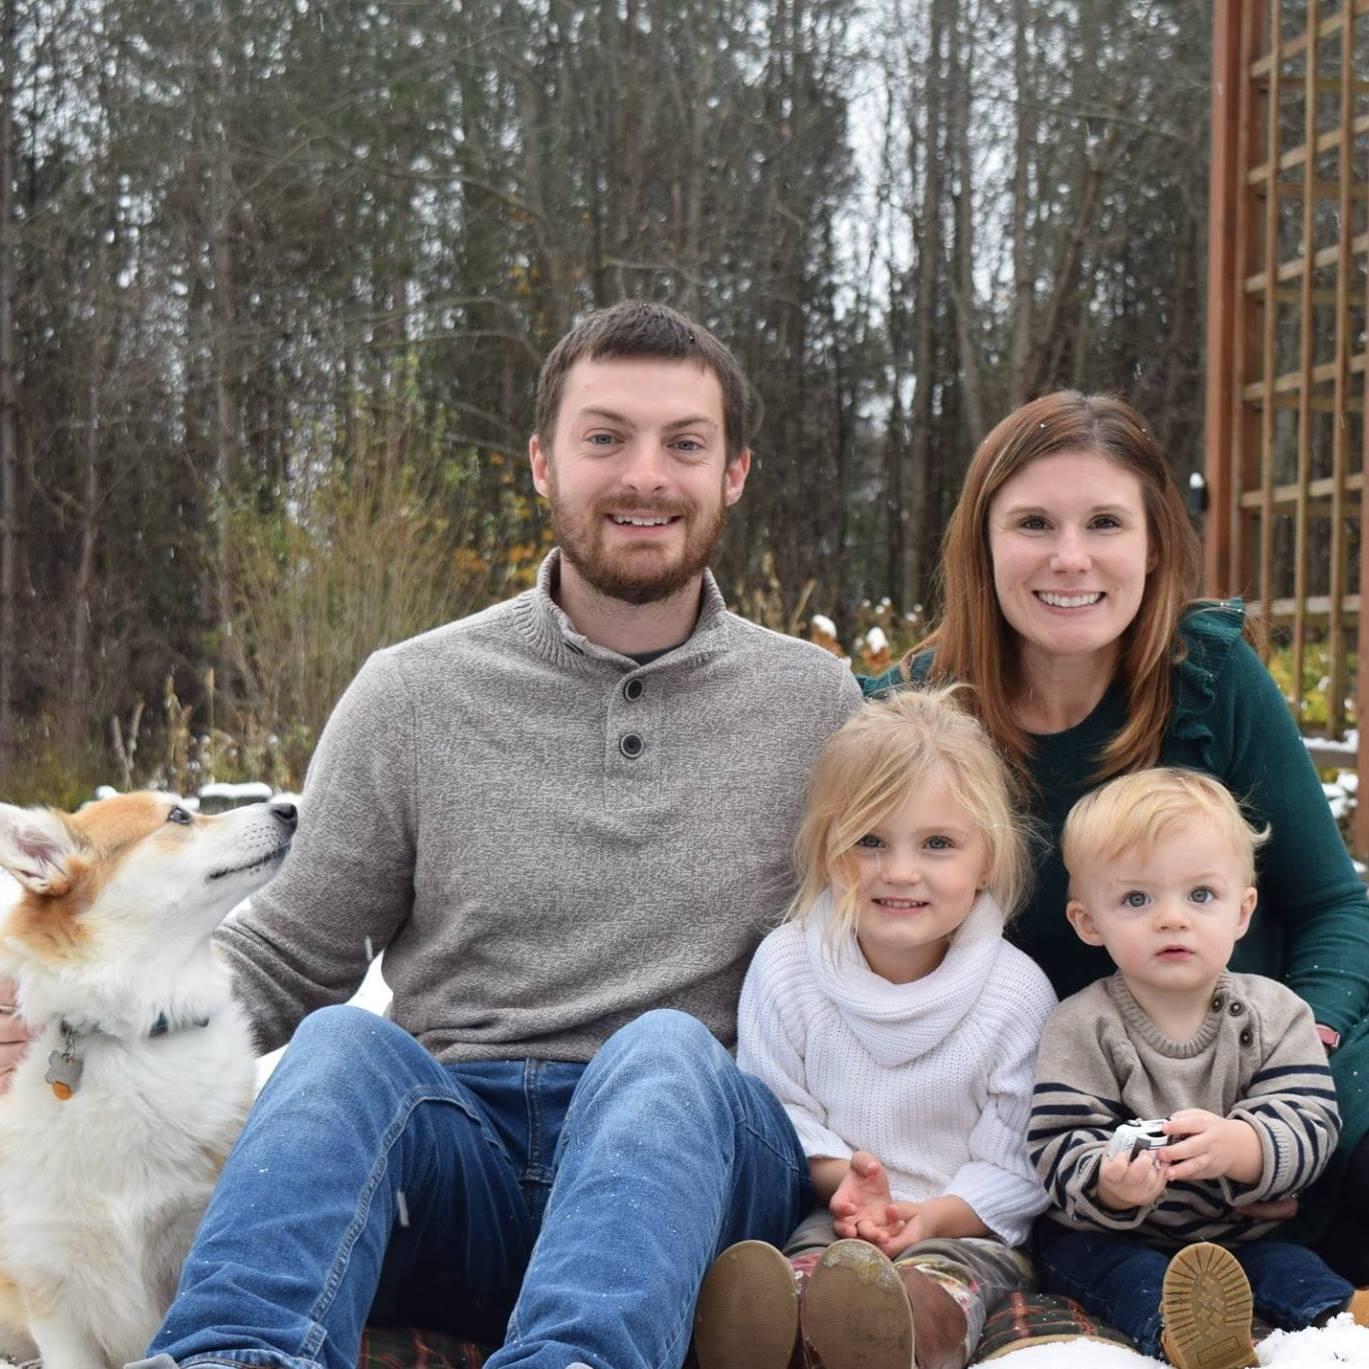 Dr. Froebel's Family